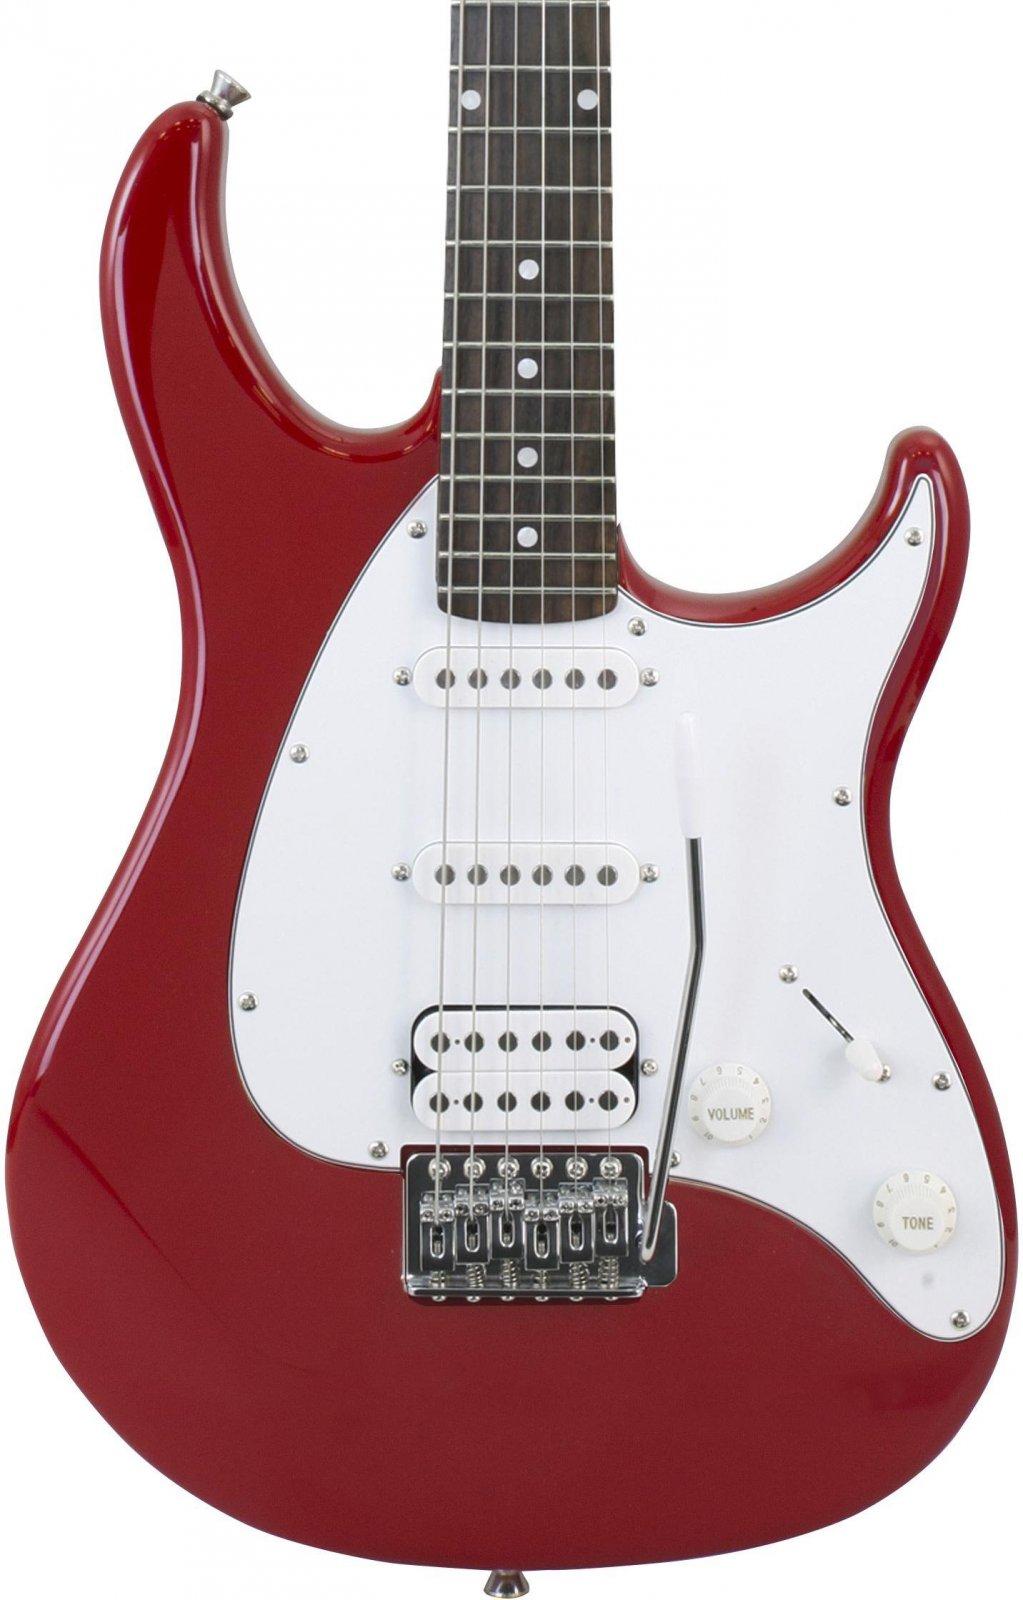 Peavey Raptor Plus Electric Guitar SSH - Red